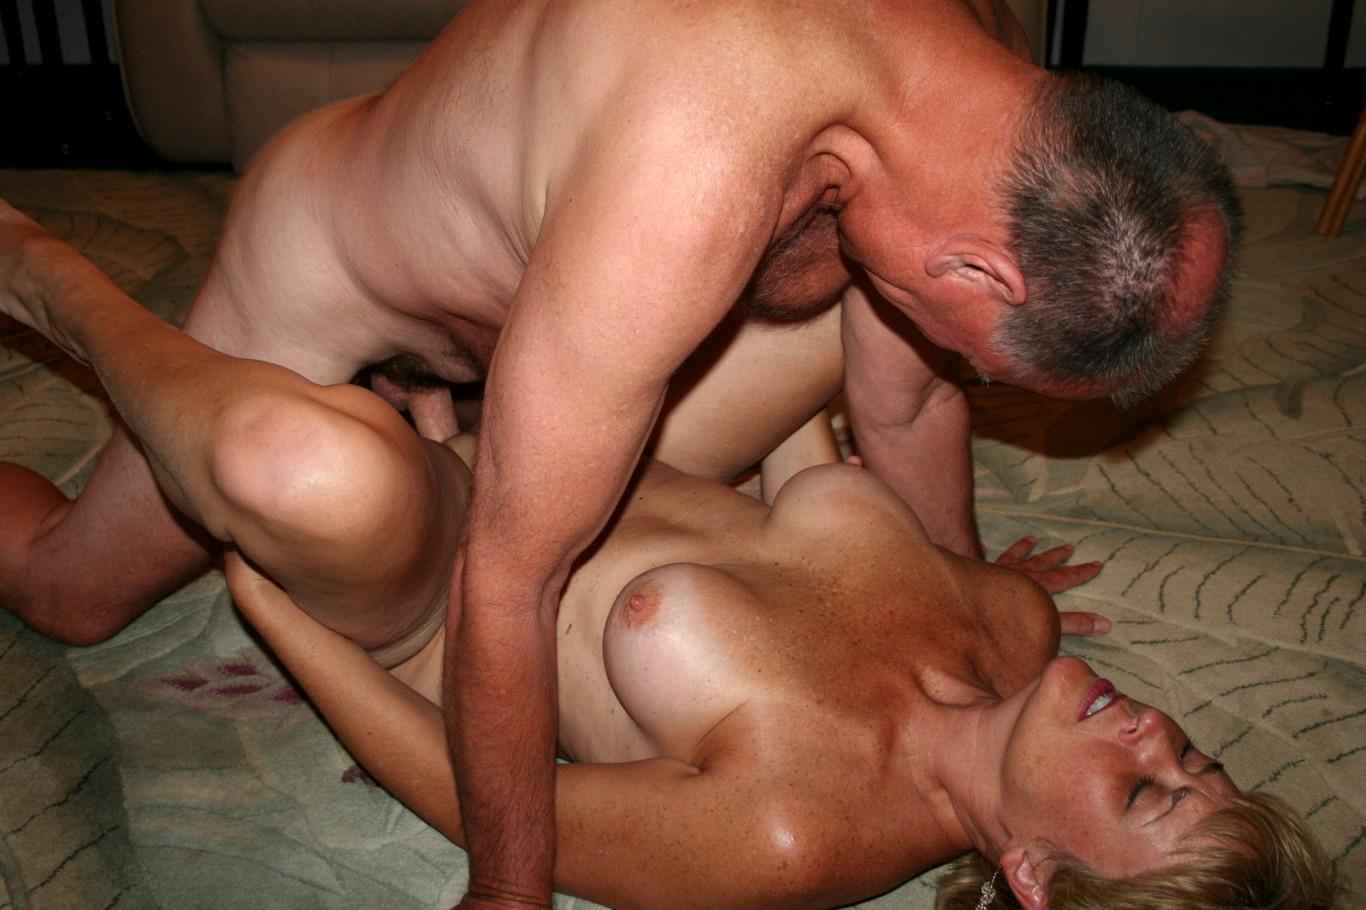 Free s sex big cooks in boy adult xxx mpeg vids gay twink porno post